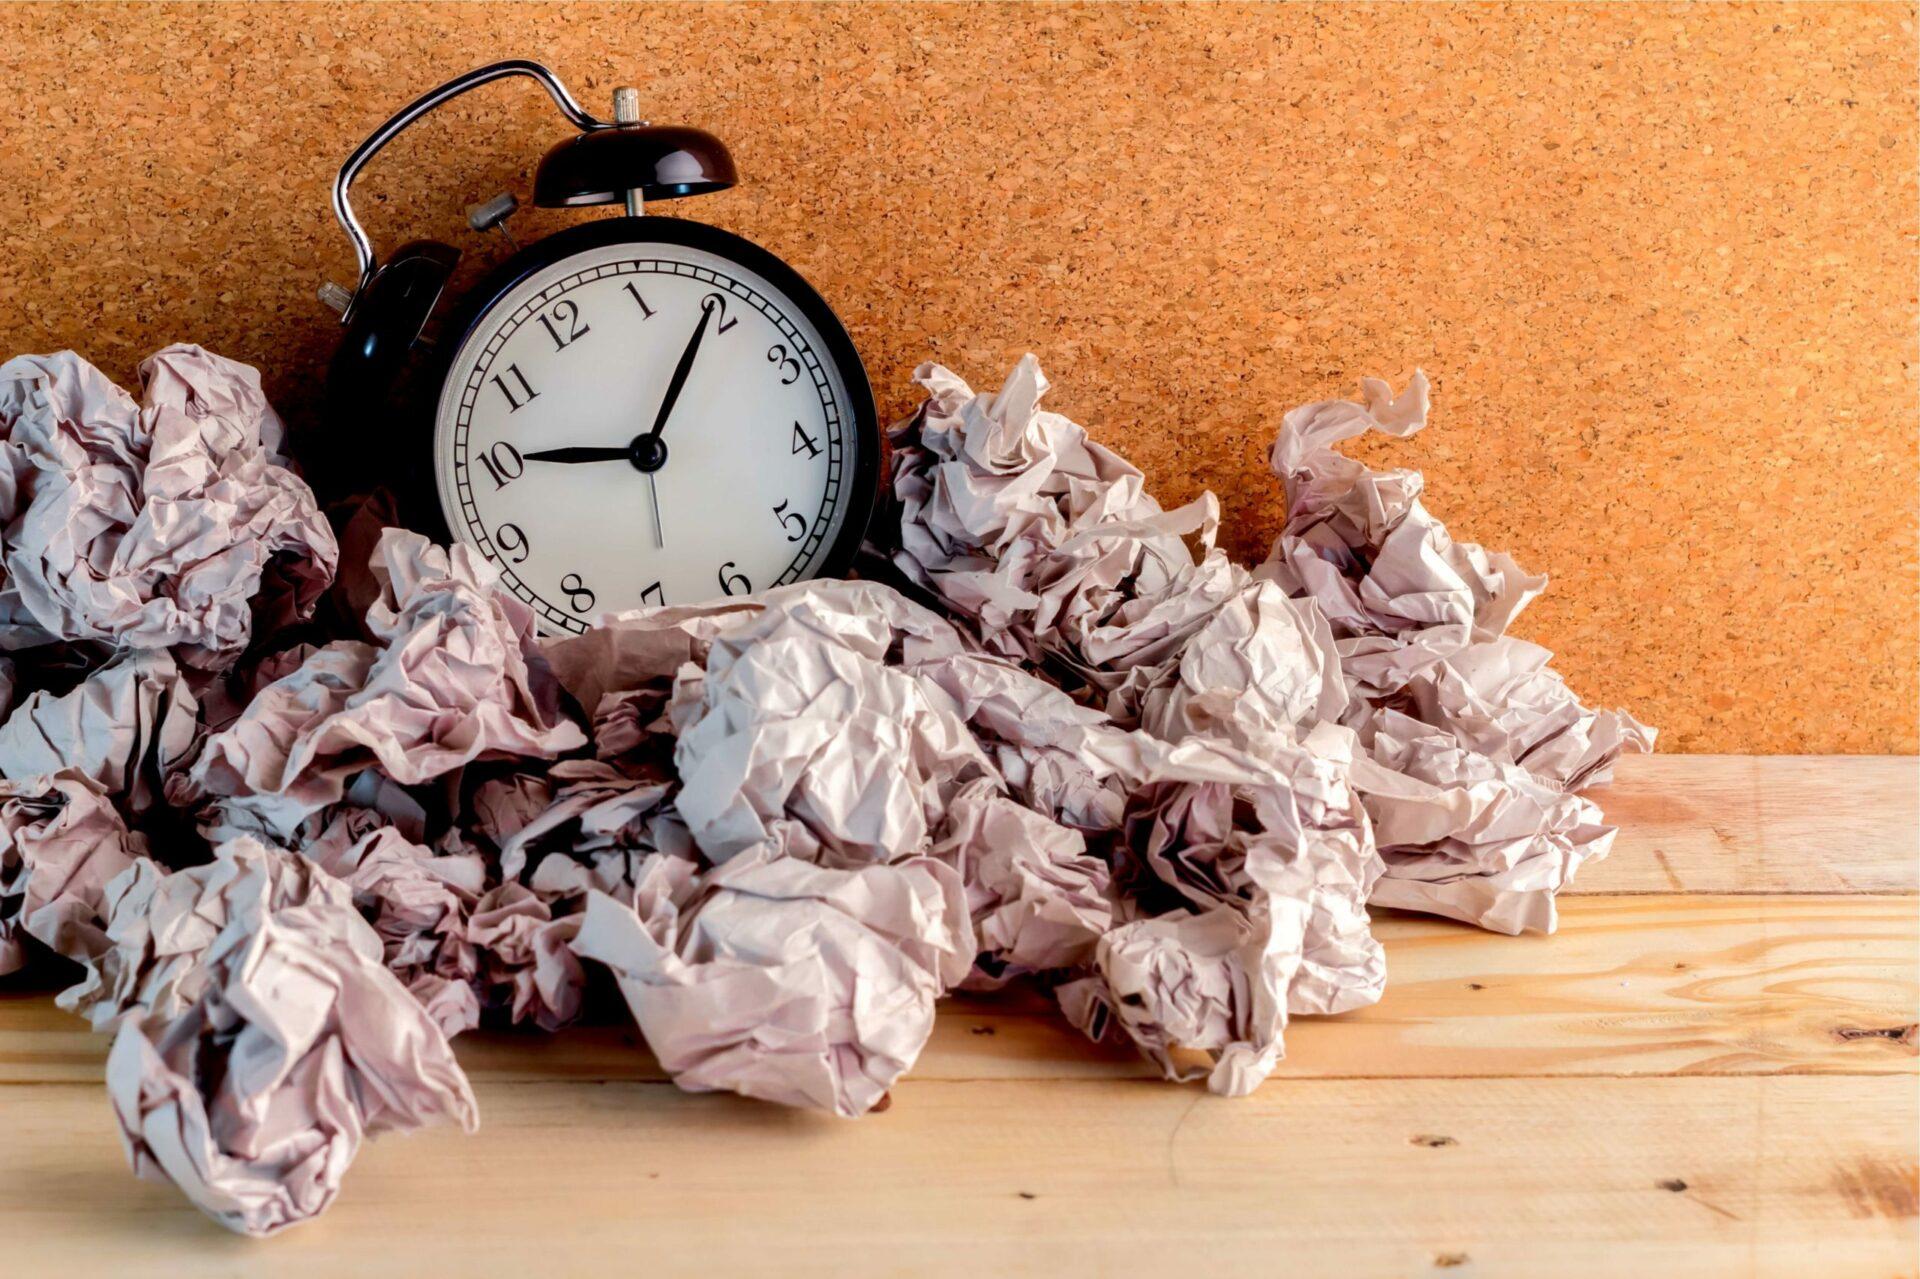 productivity blindspots, productivity blind spots, productivity hacks,